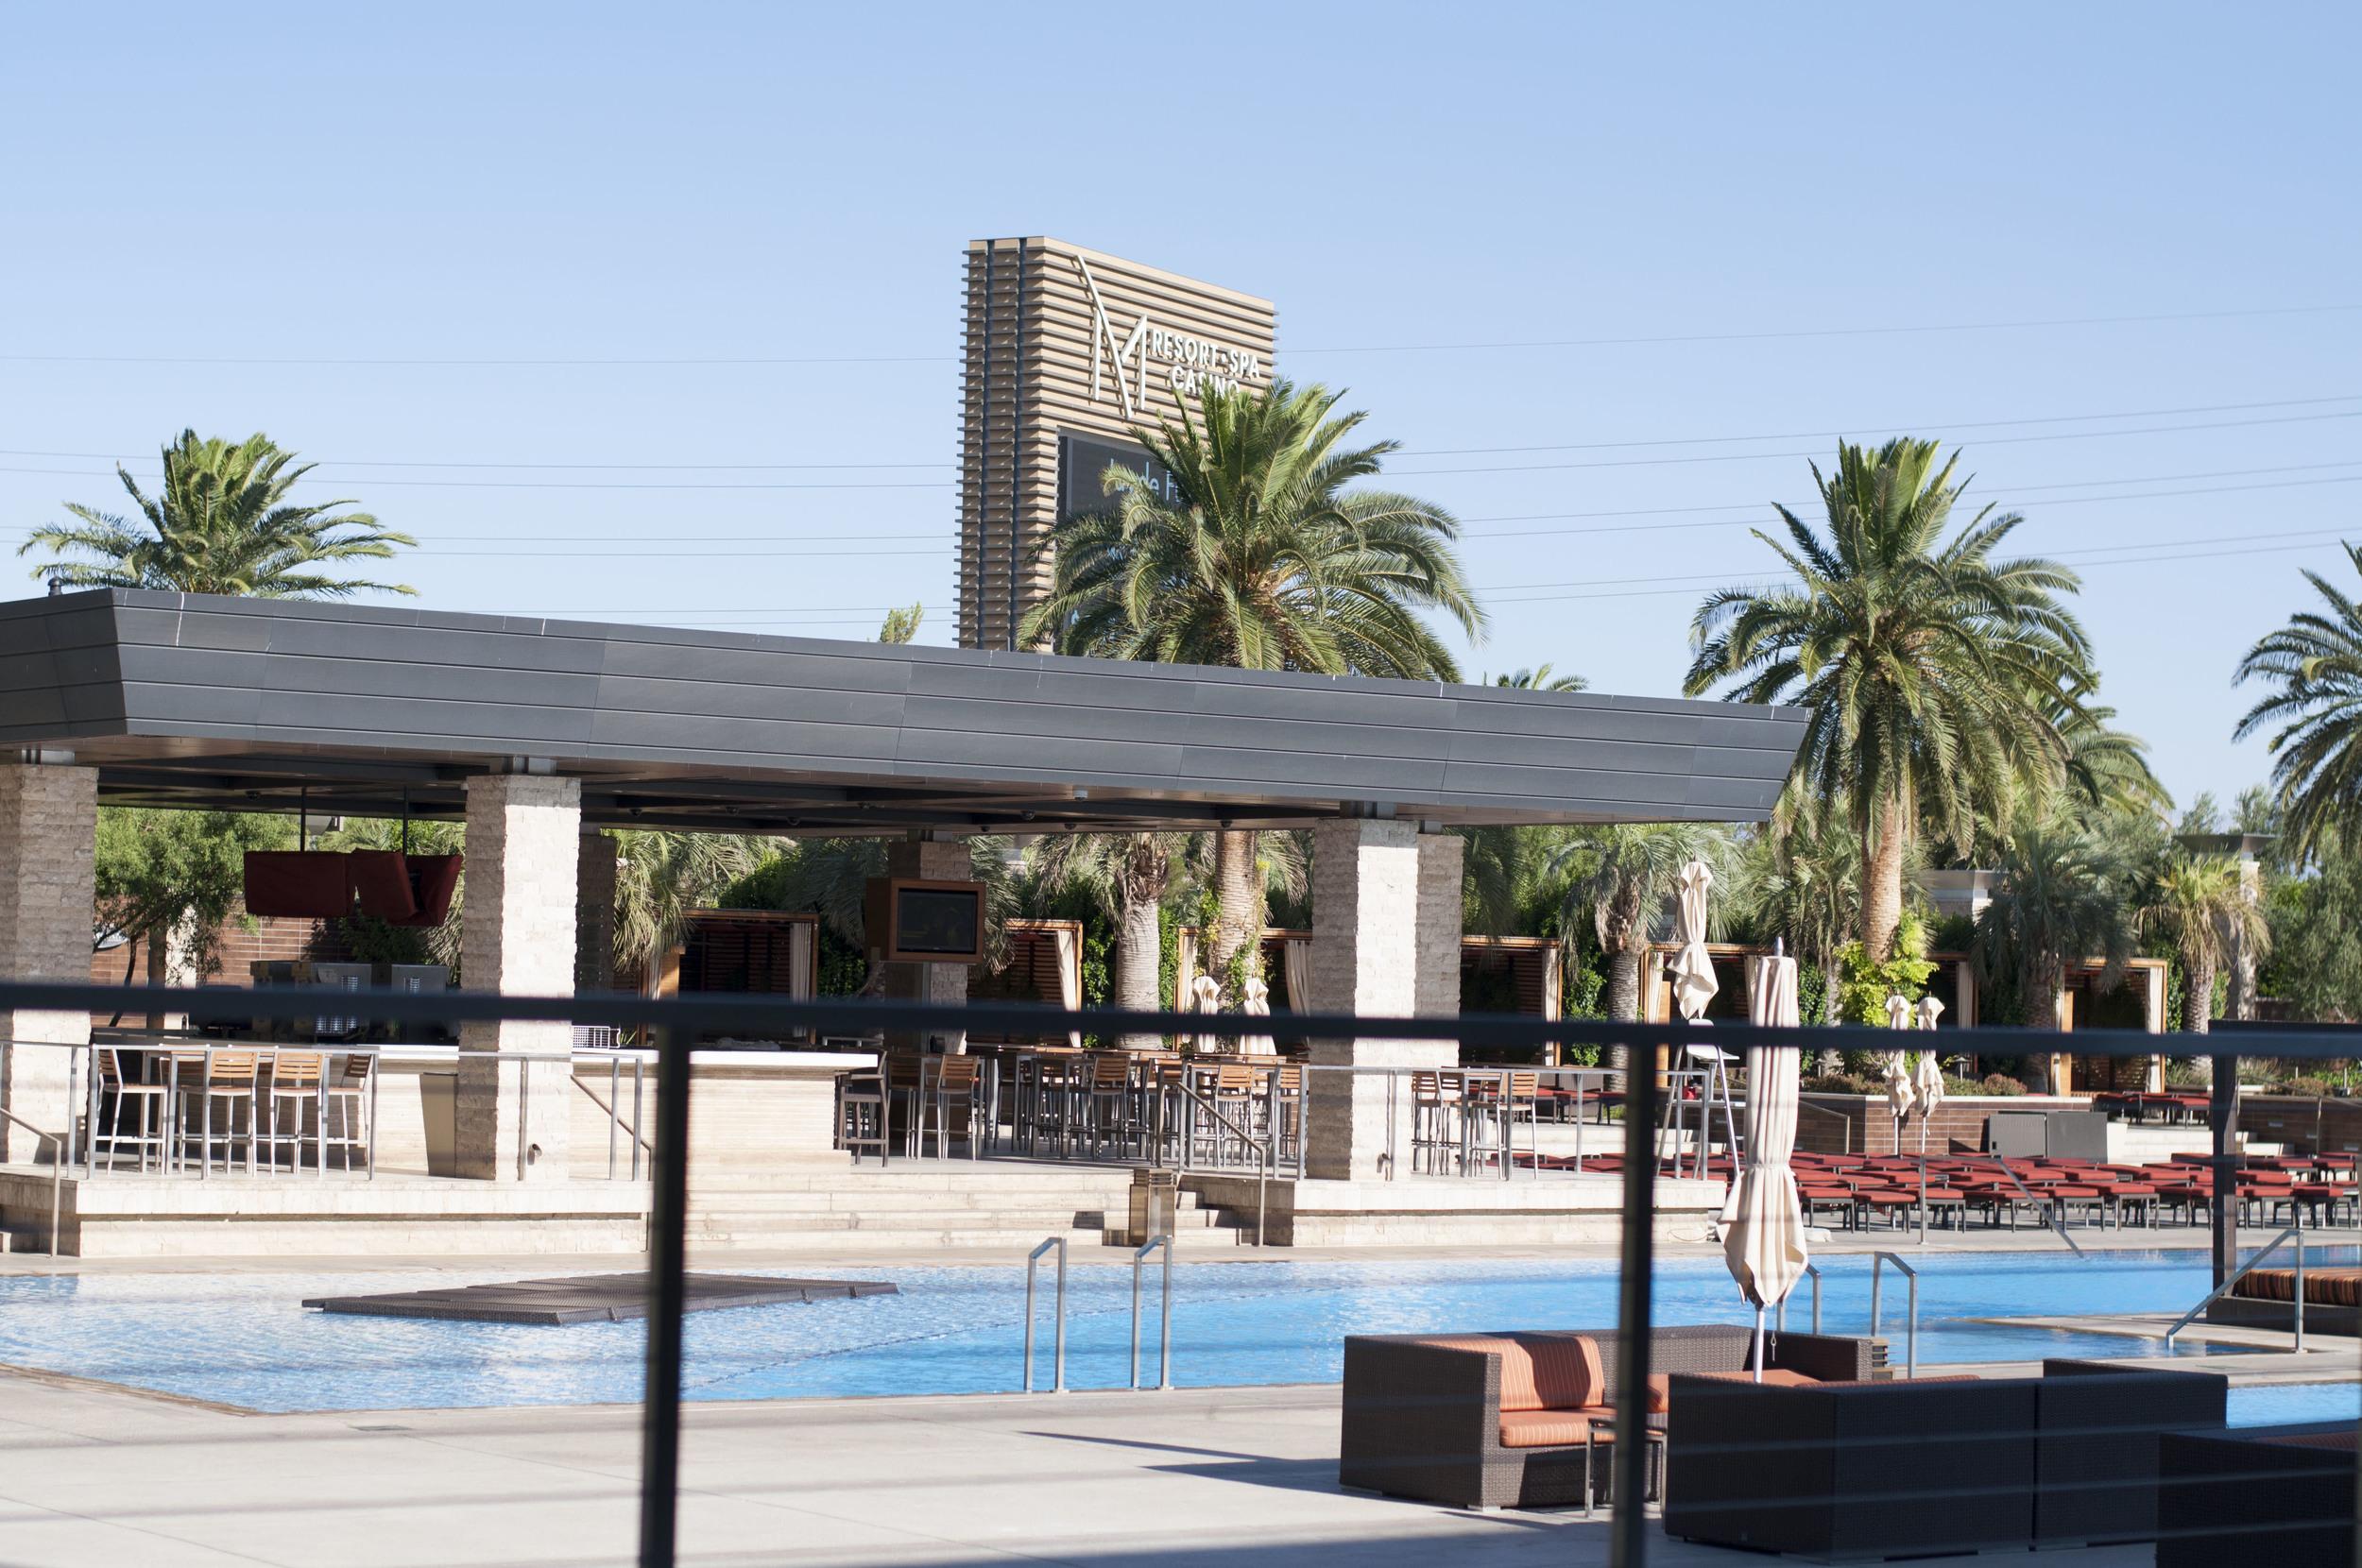 Las Vegas_45.jpg